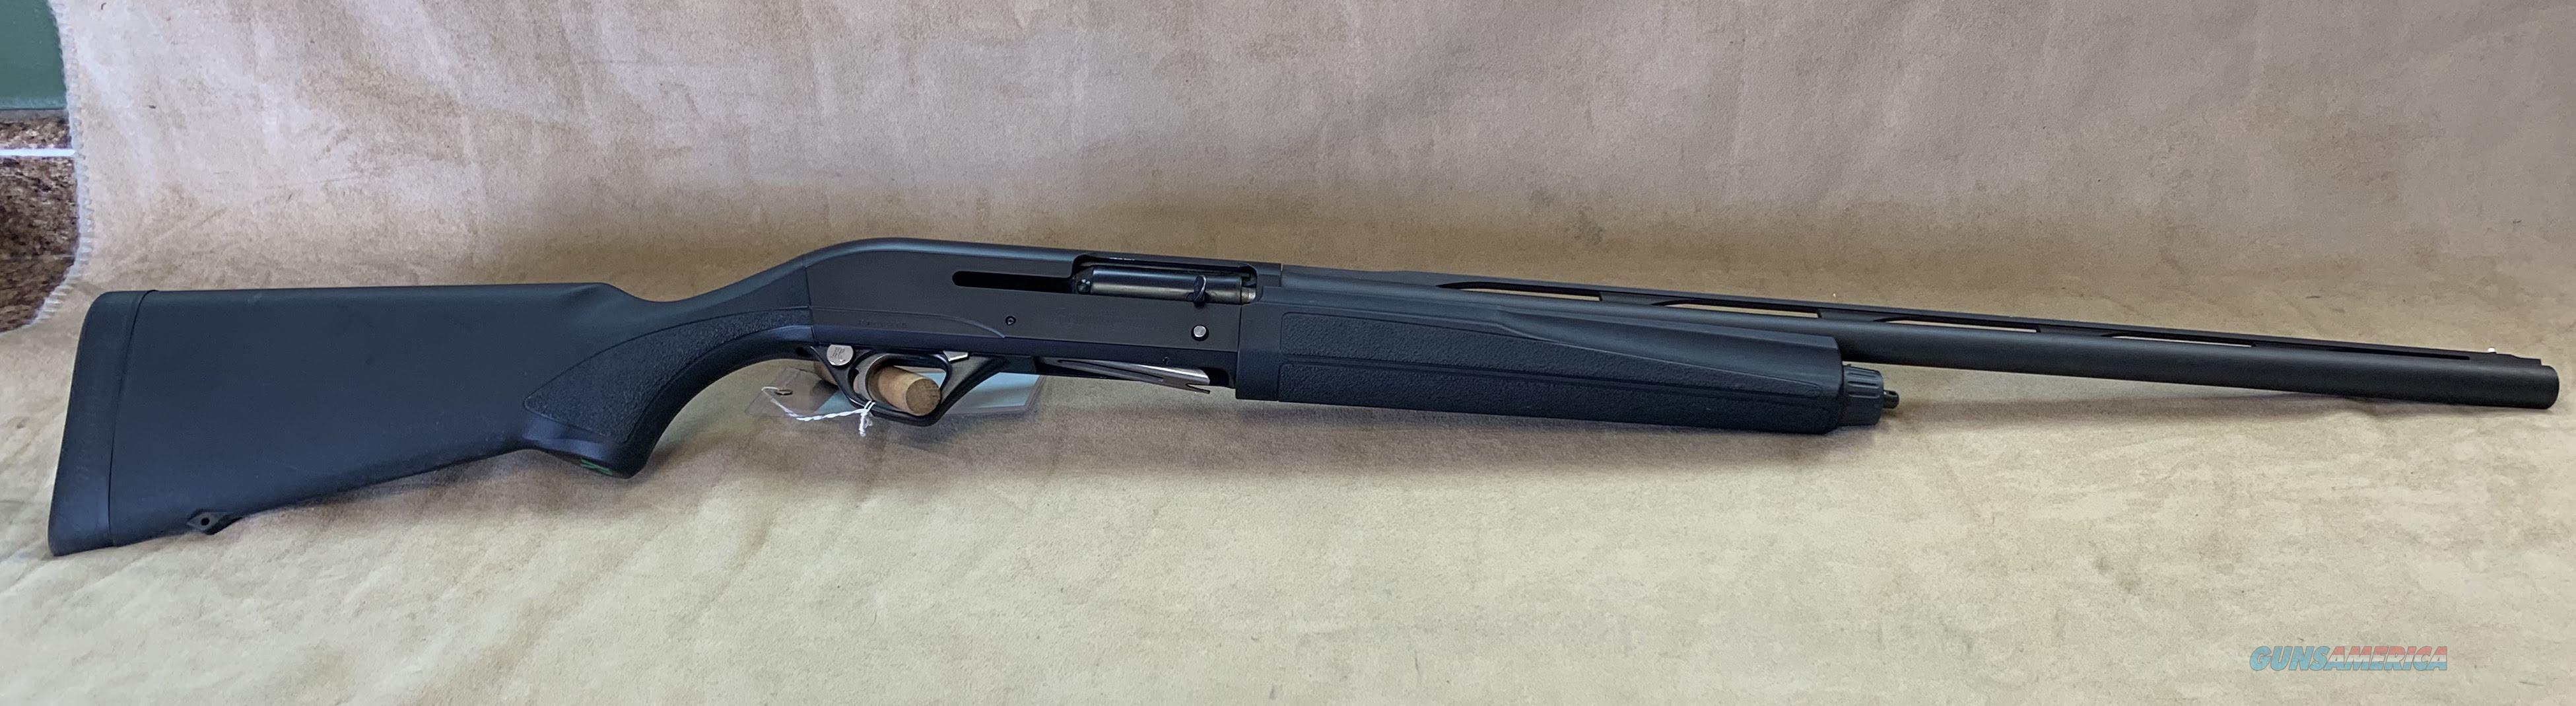 "81046 Remington Versamax Sportsman 26"" - 12 gauge USED  Guns > Shotguns > Remington Shotguns  > Autoloaders > Hunting"